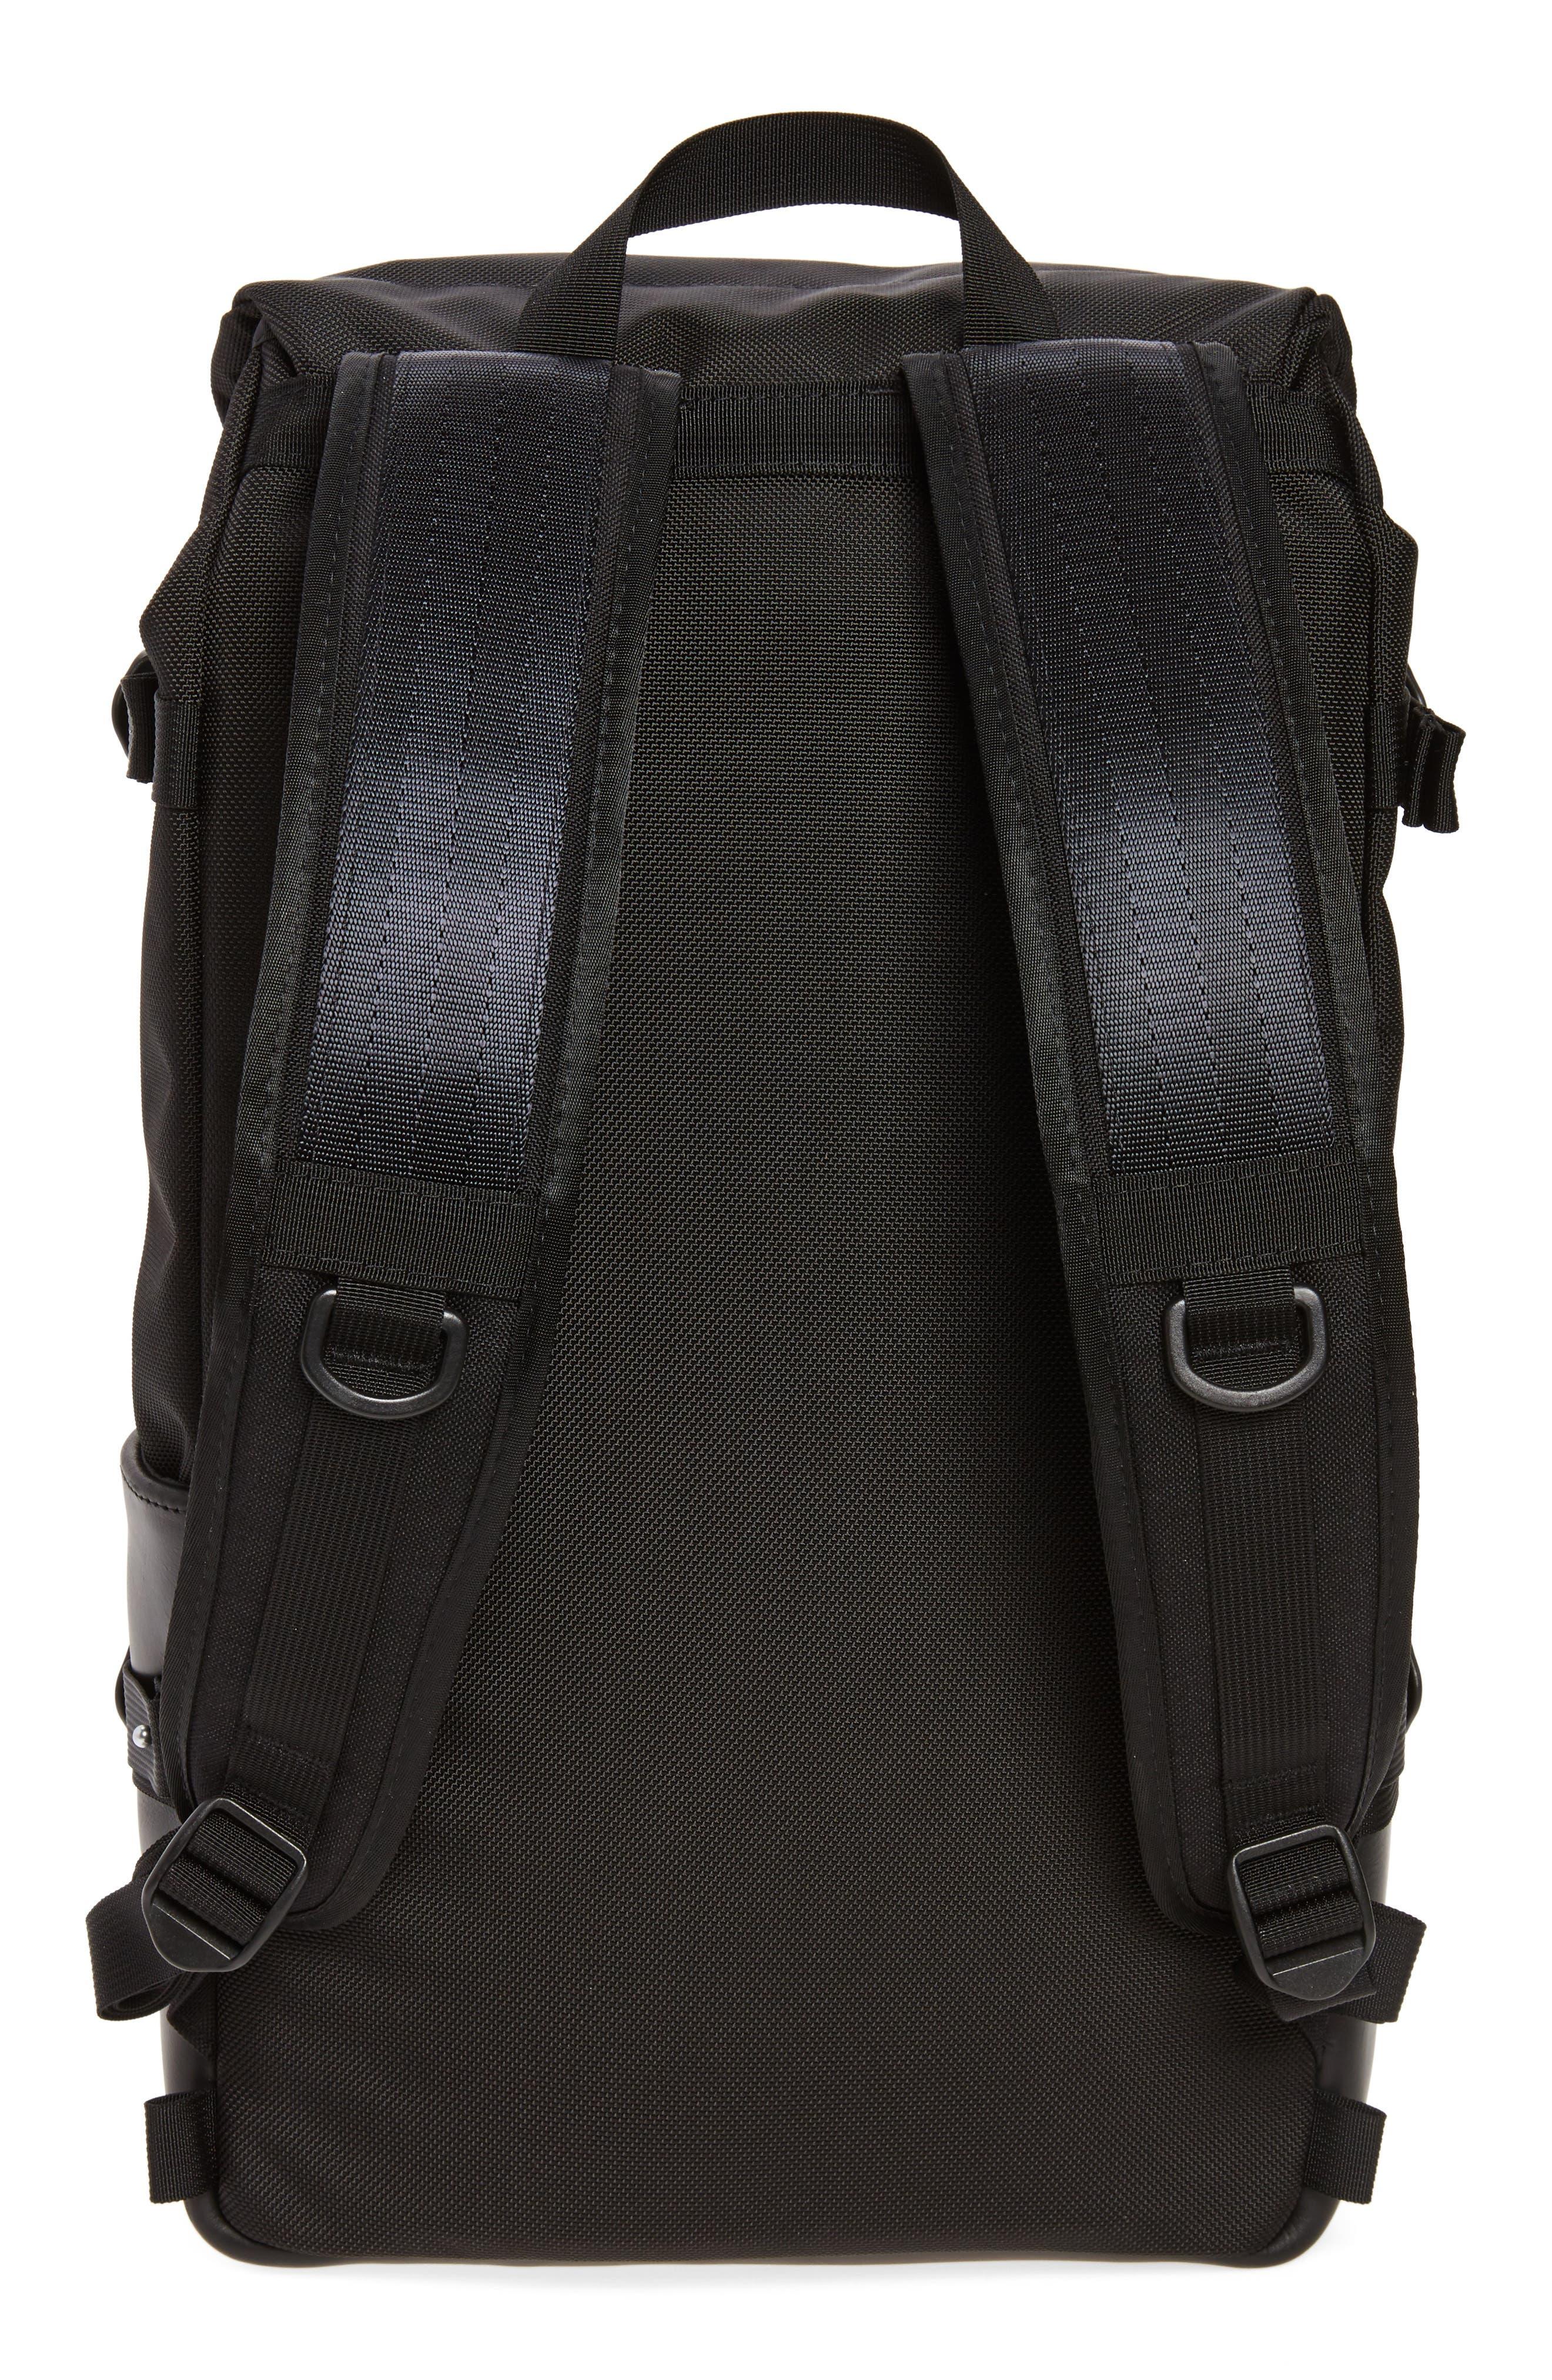 Alternate Image 3  - Topo Designs 'Klettersack' Backpack